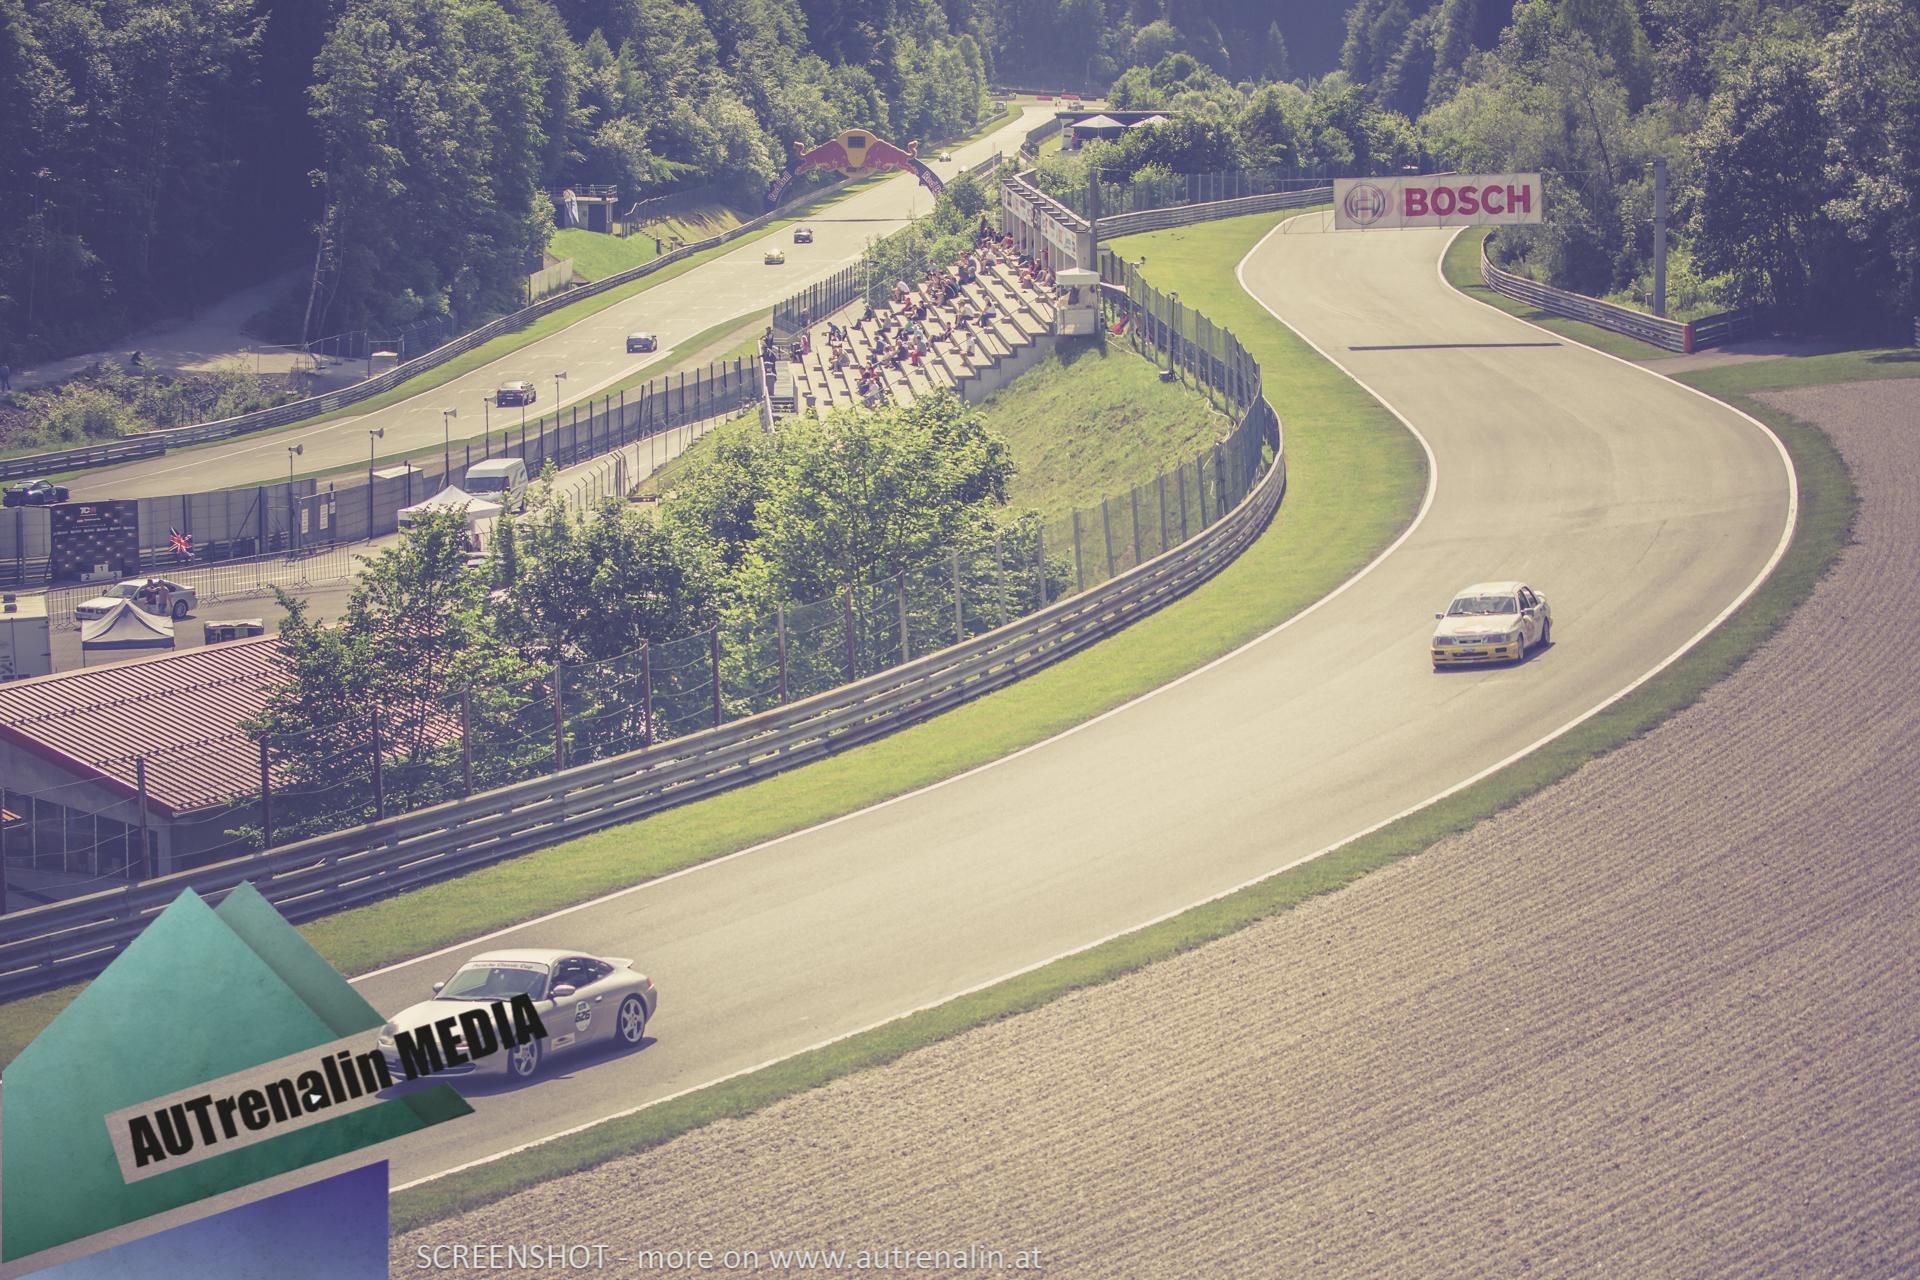 SportwagenCup_Salzburgring-Mai-2018_AUTrenalinMEDIA_web-6407.jpg